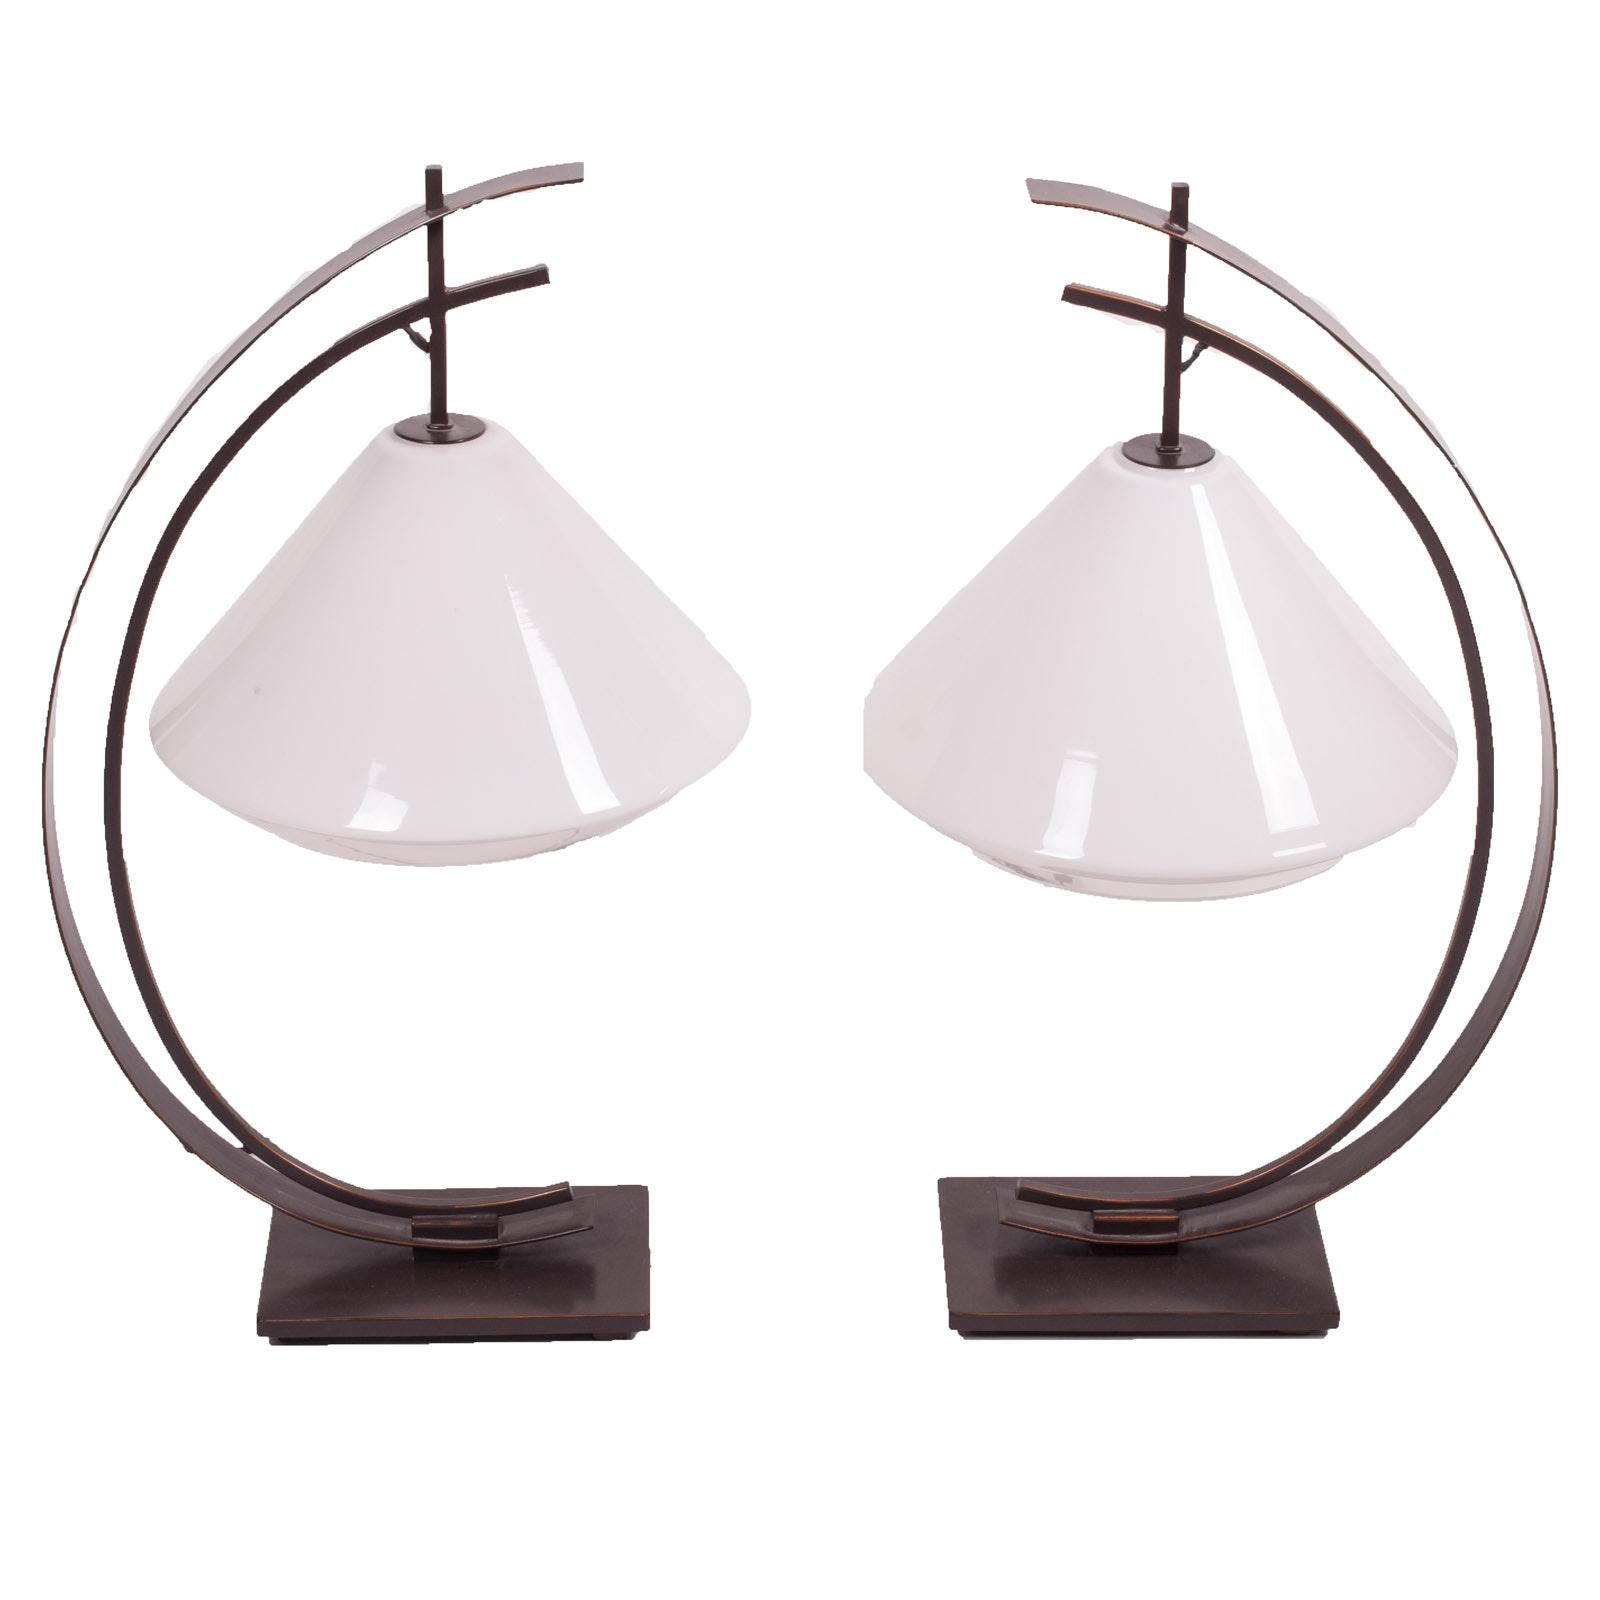 Kathy Ireland Orbit Table Lamps